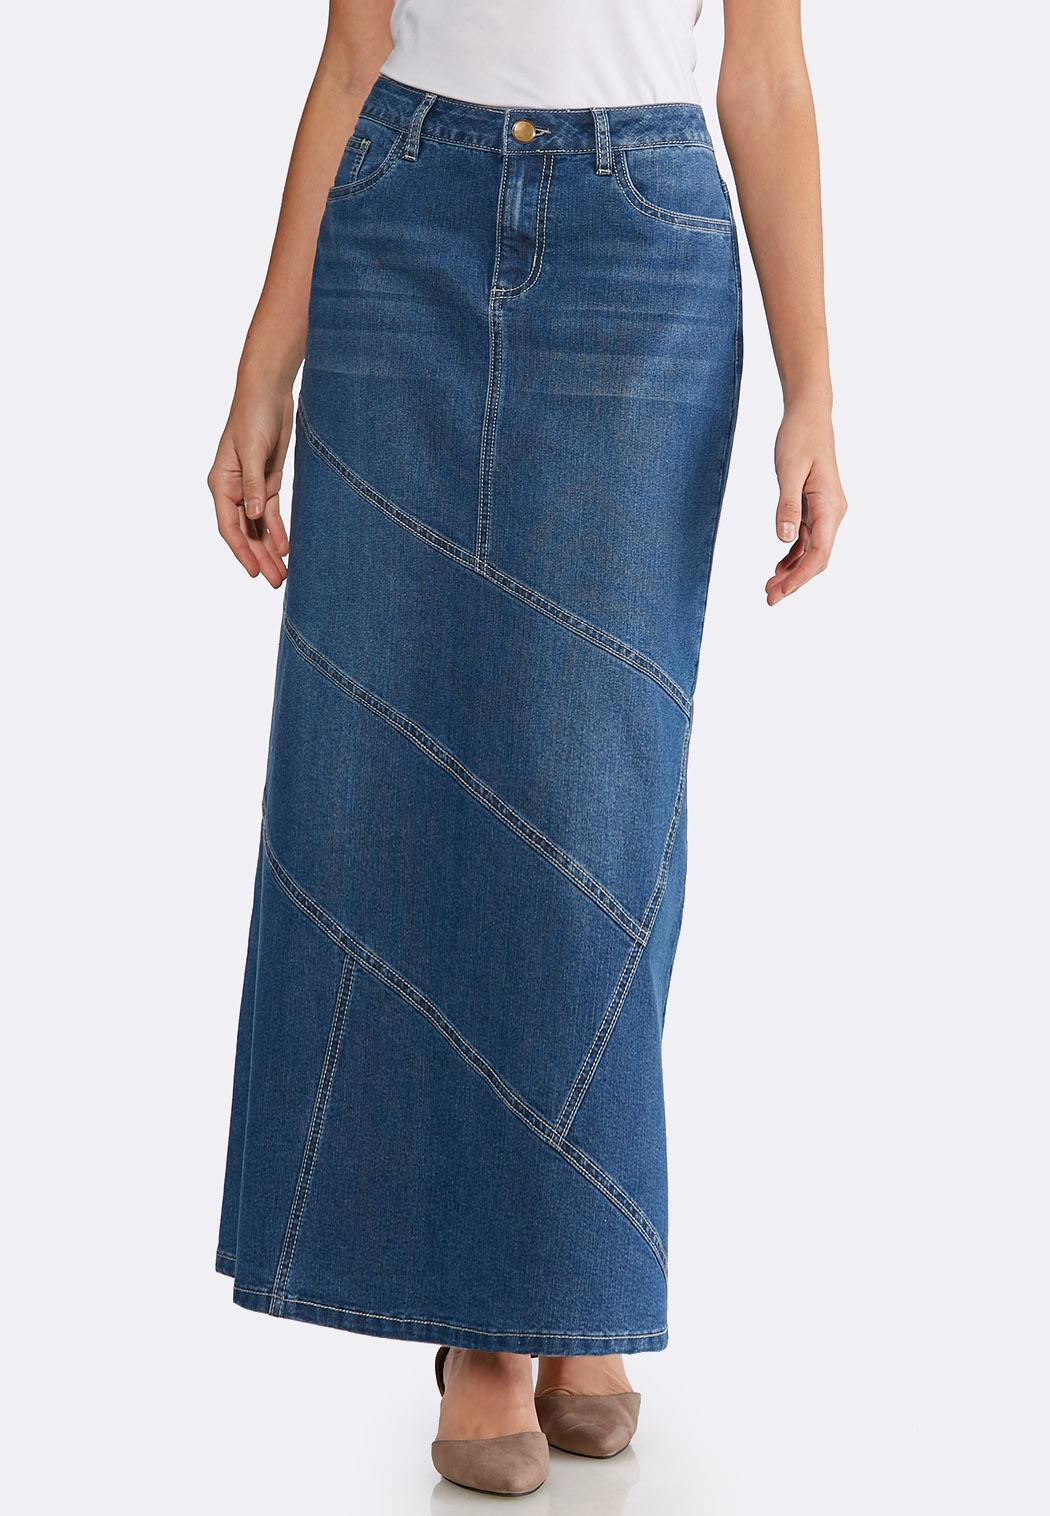 Plus Size Denim Multi Seam Maxi Skirt Denim Cato Fashions